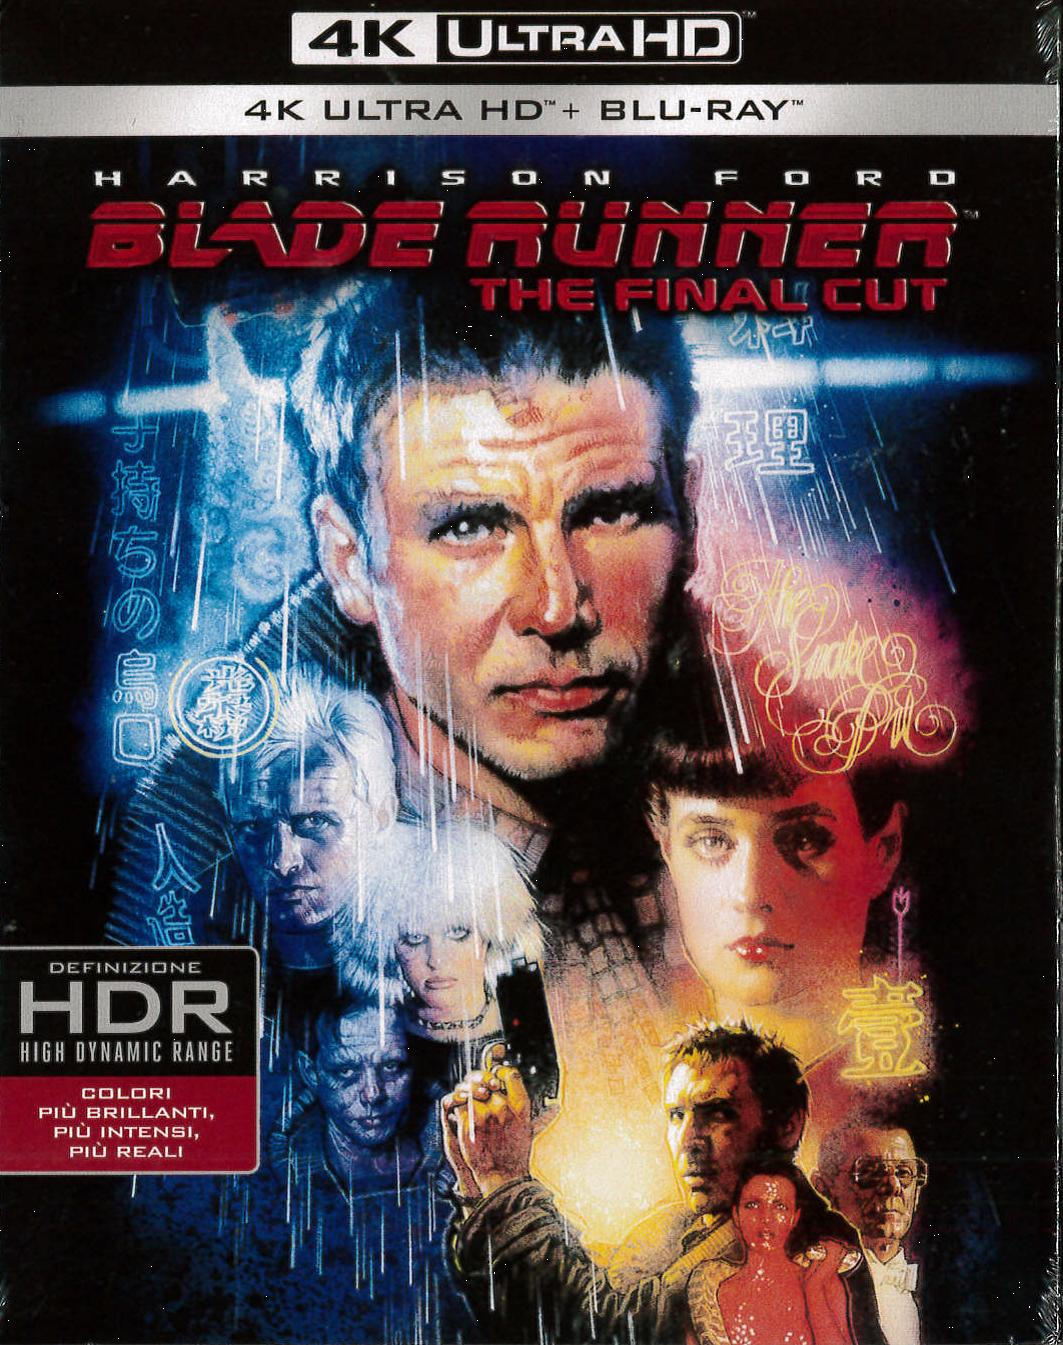 BLADE RUNNER - THE FINAL CUT (4K ULTRA HD+BLU-RAY)